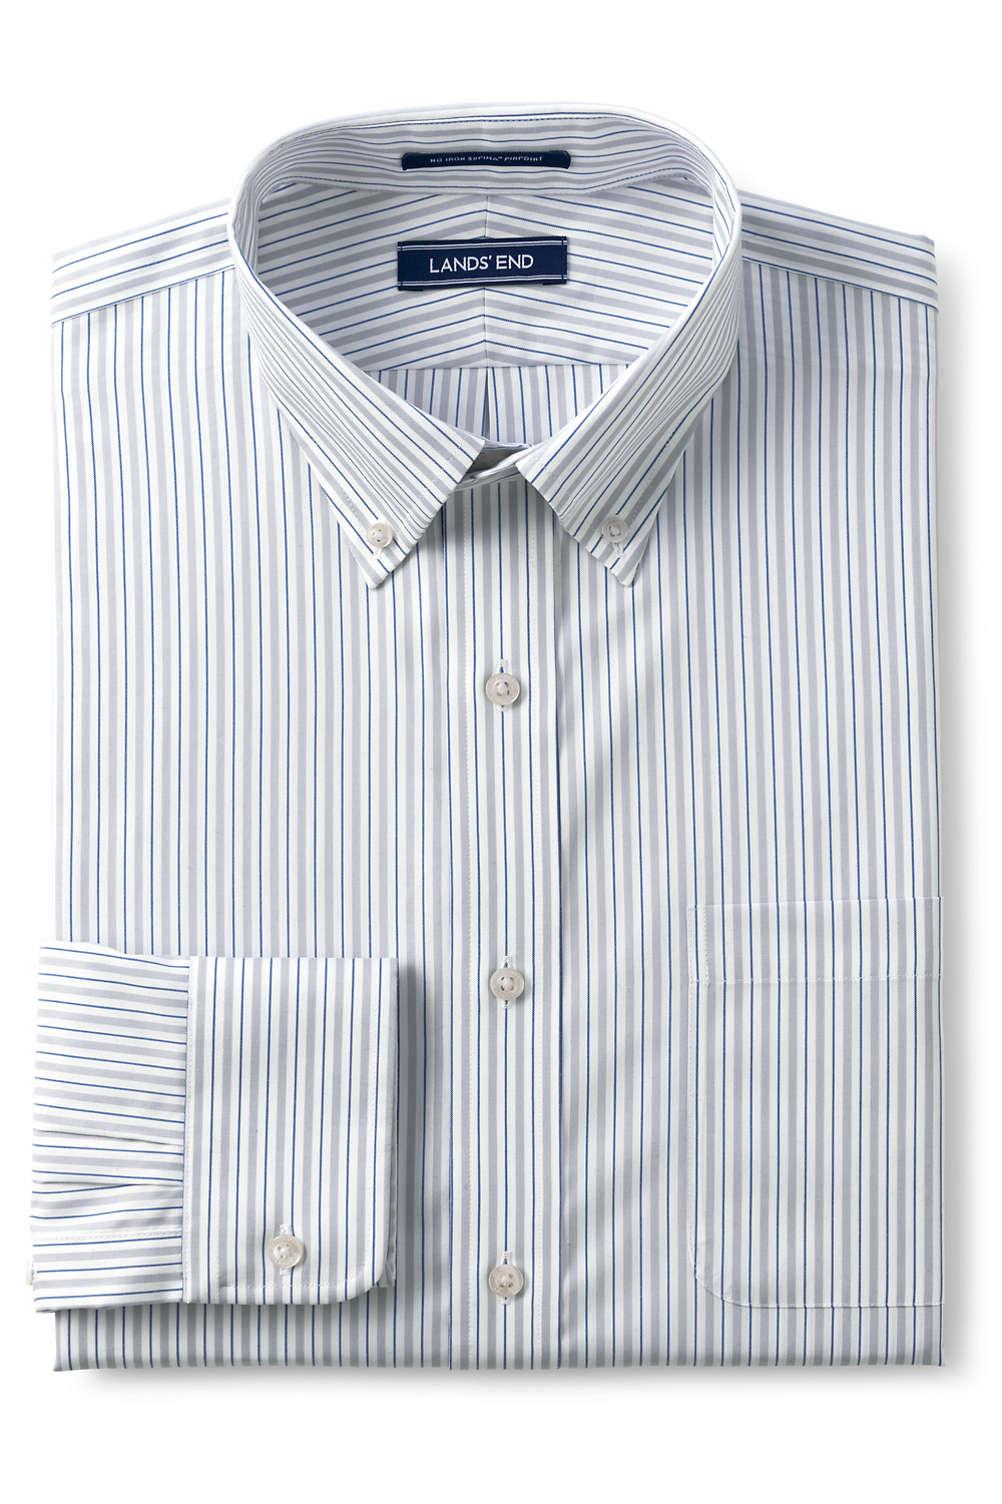 6bac59ba1a7 Men s Traditional Fit Pattern No Iron Supima Pinpoint Buttondown Collar  Dress Shirt